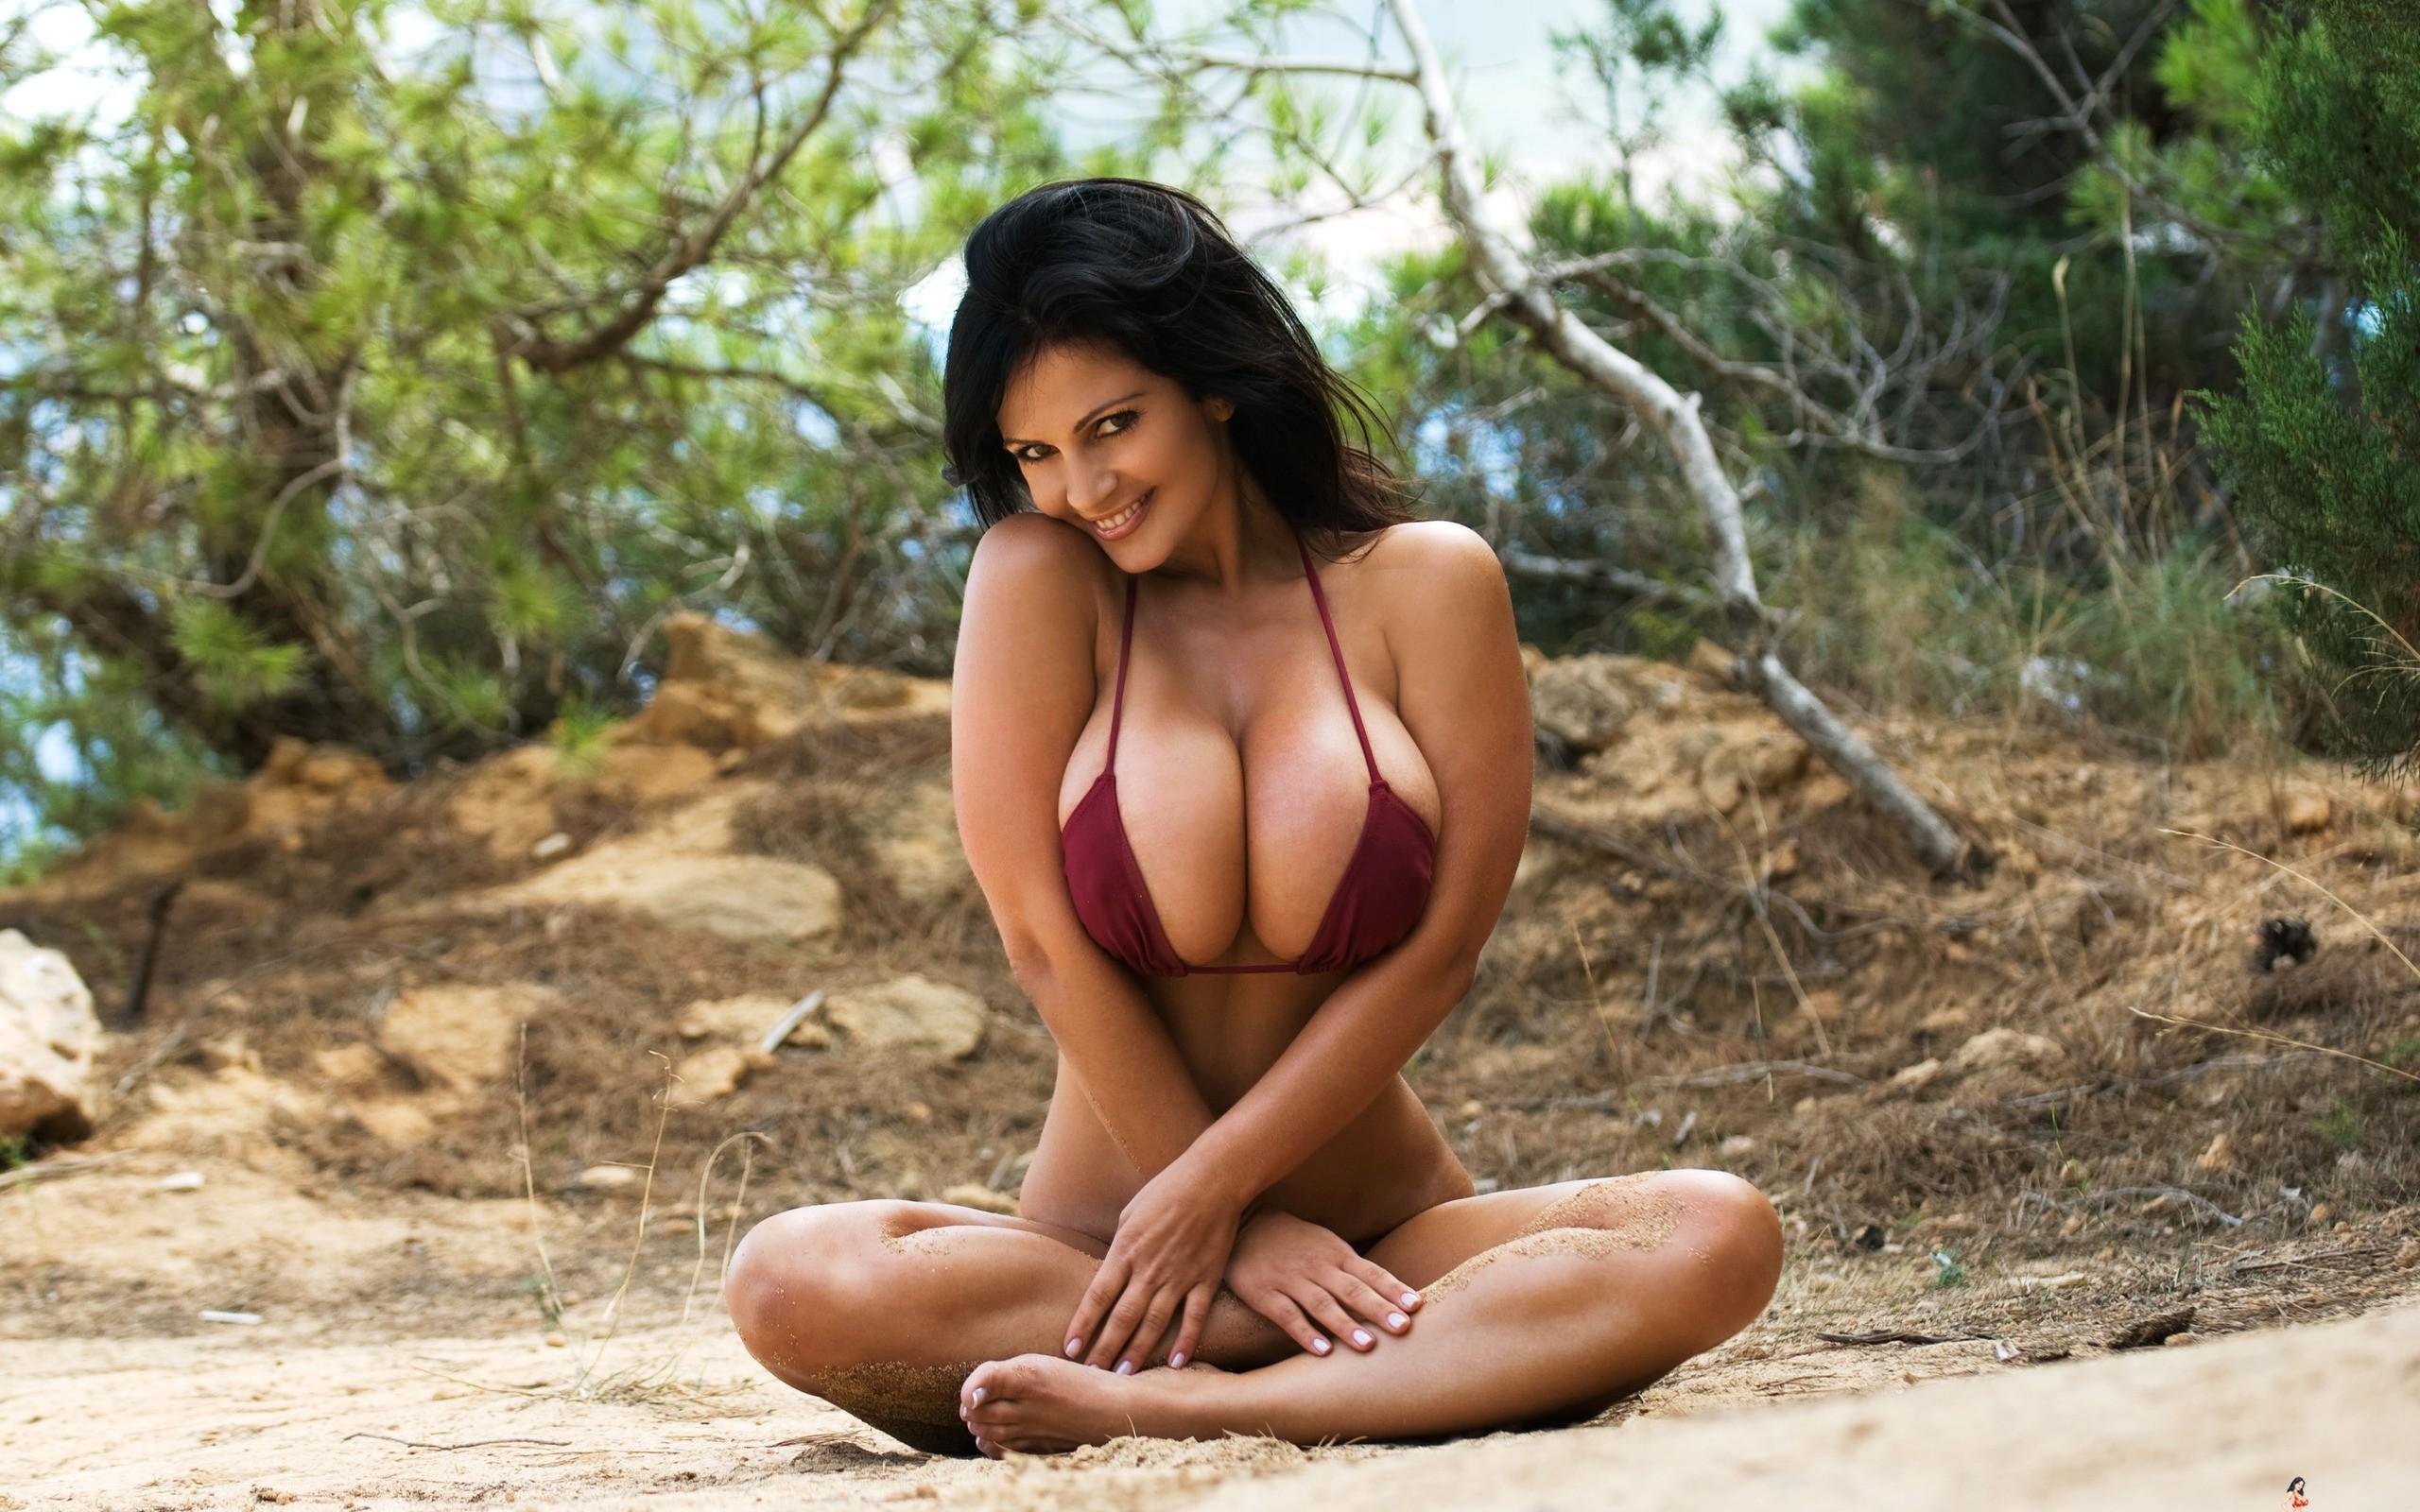 Big tits blonde bikini pool